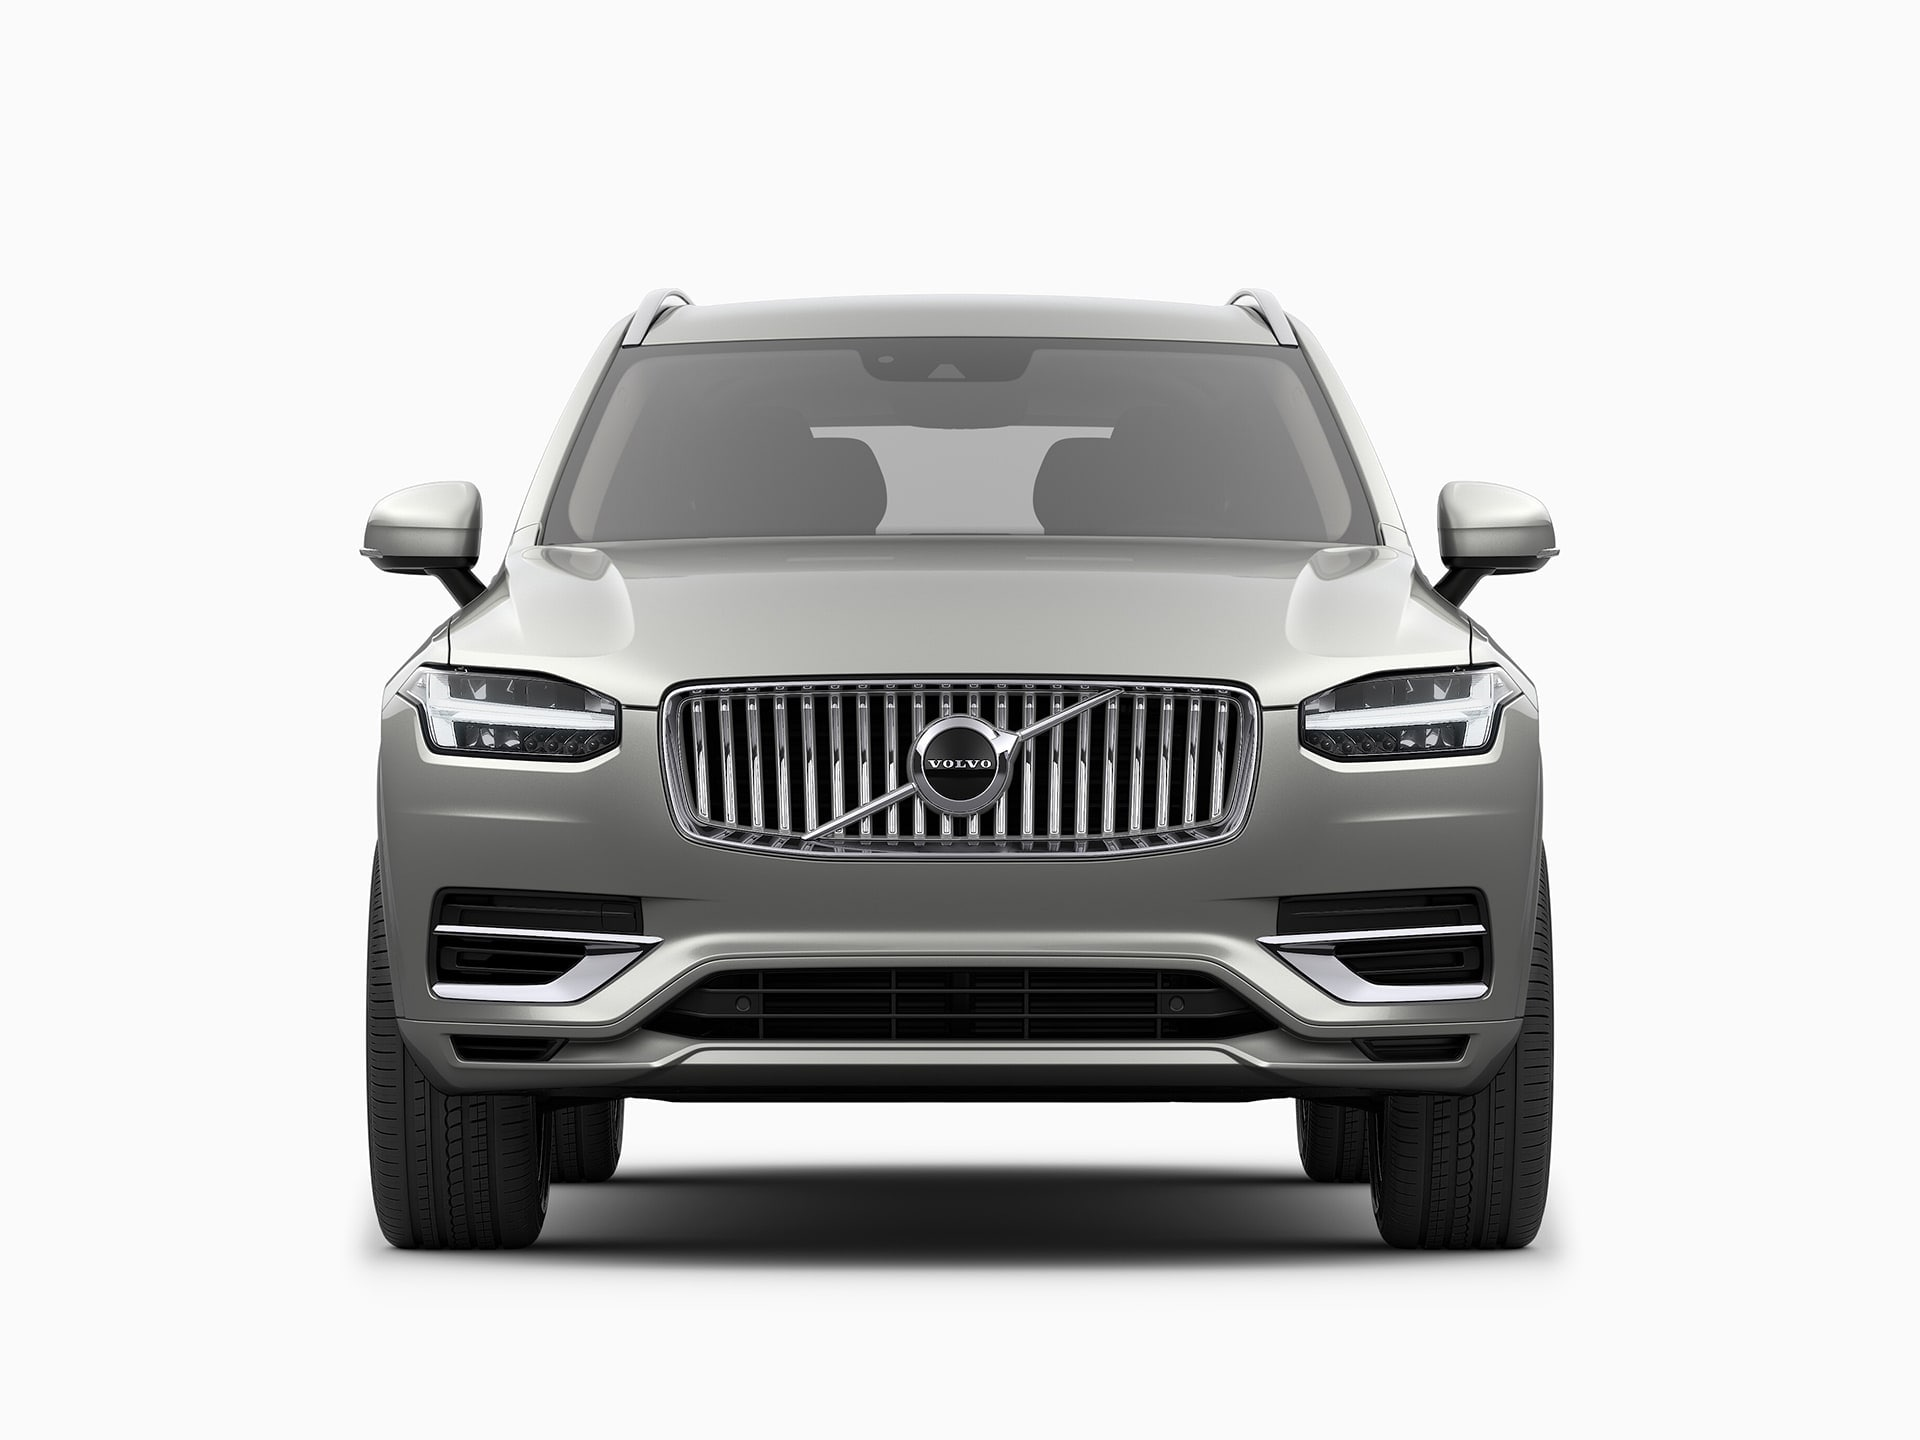 Przód hybrydy plug-in Volvo XC90 Recharge SUV.